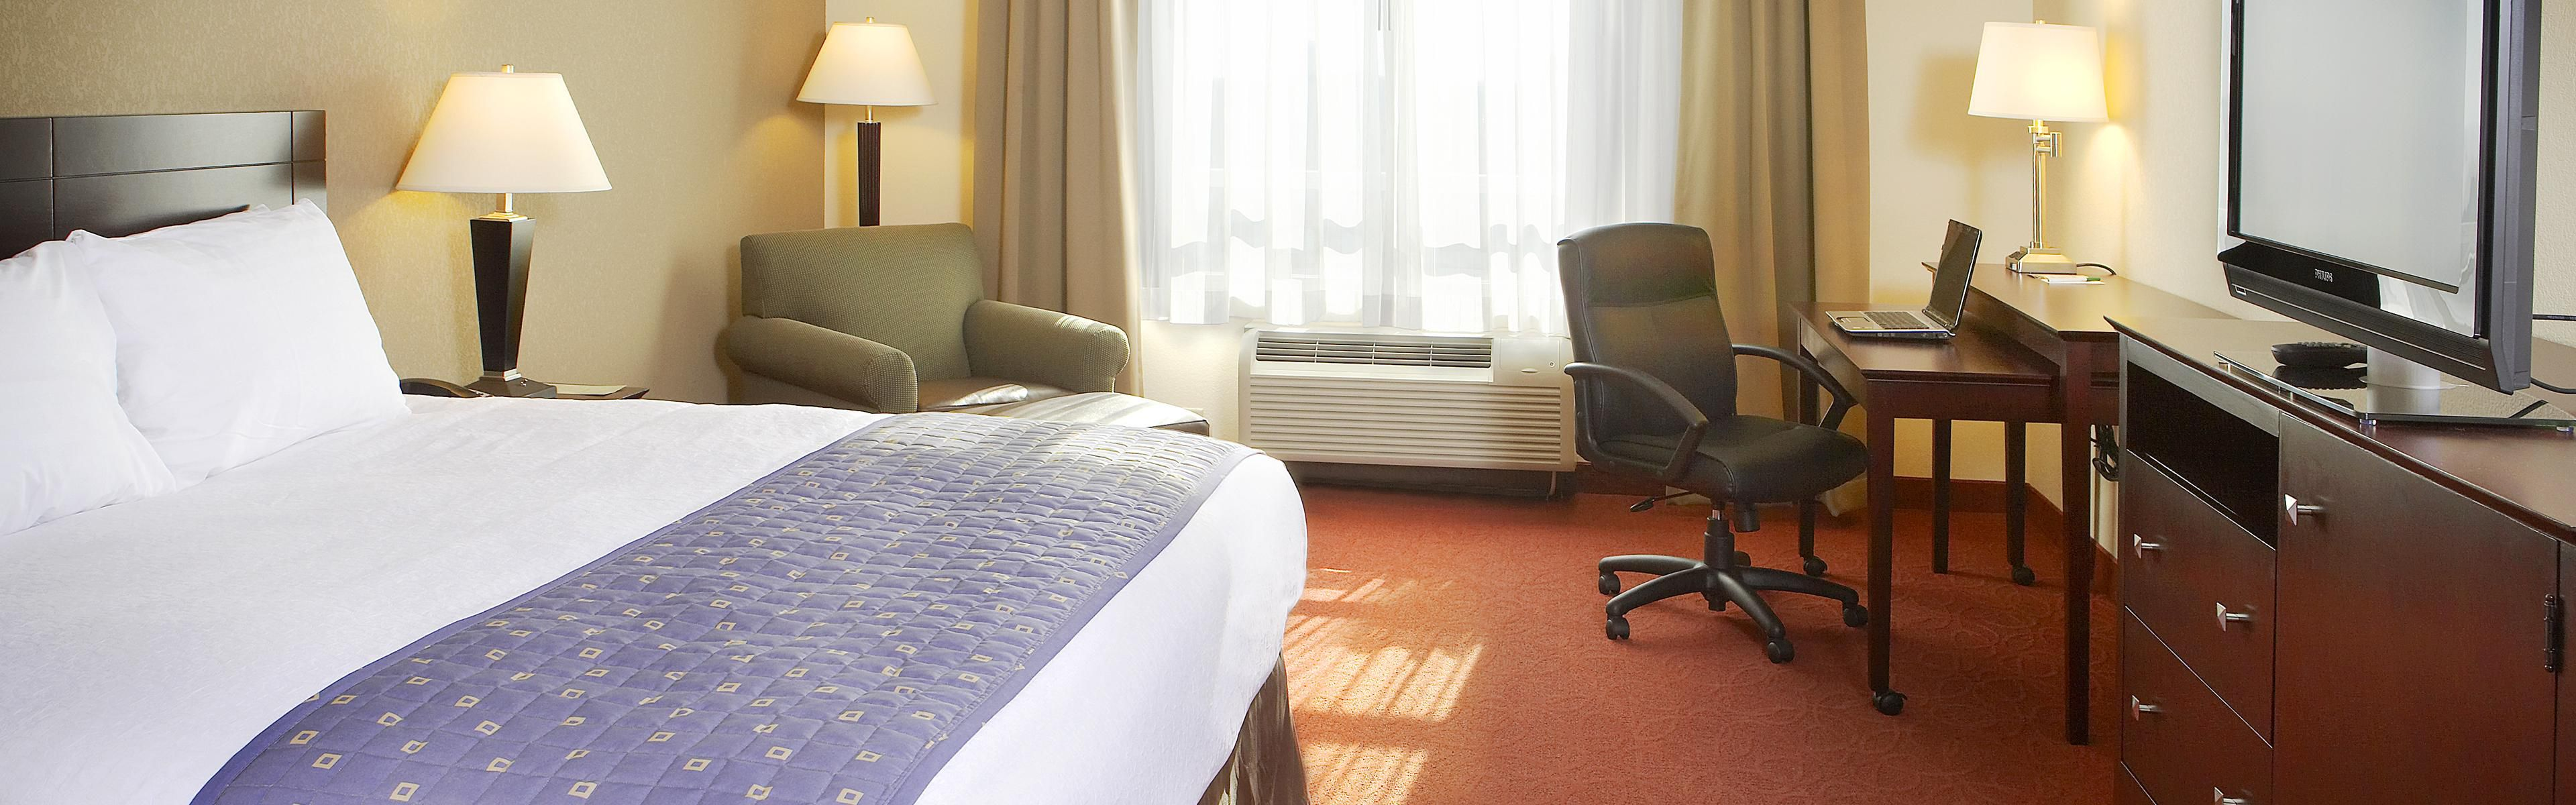 Holiday Inn & Suites West Des Moines-Jordan Creek image 1